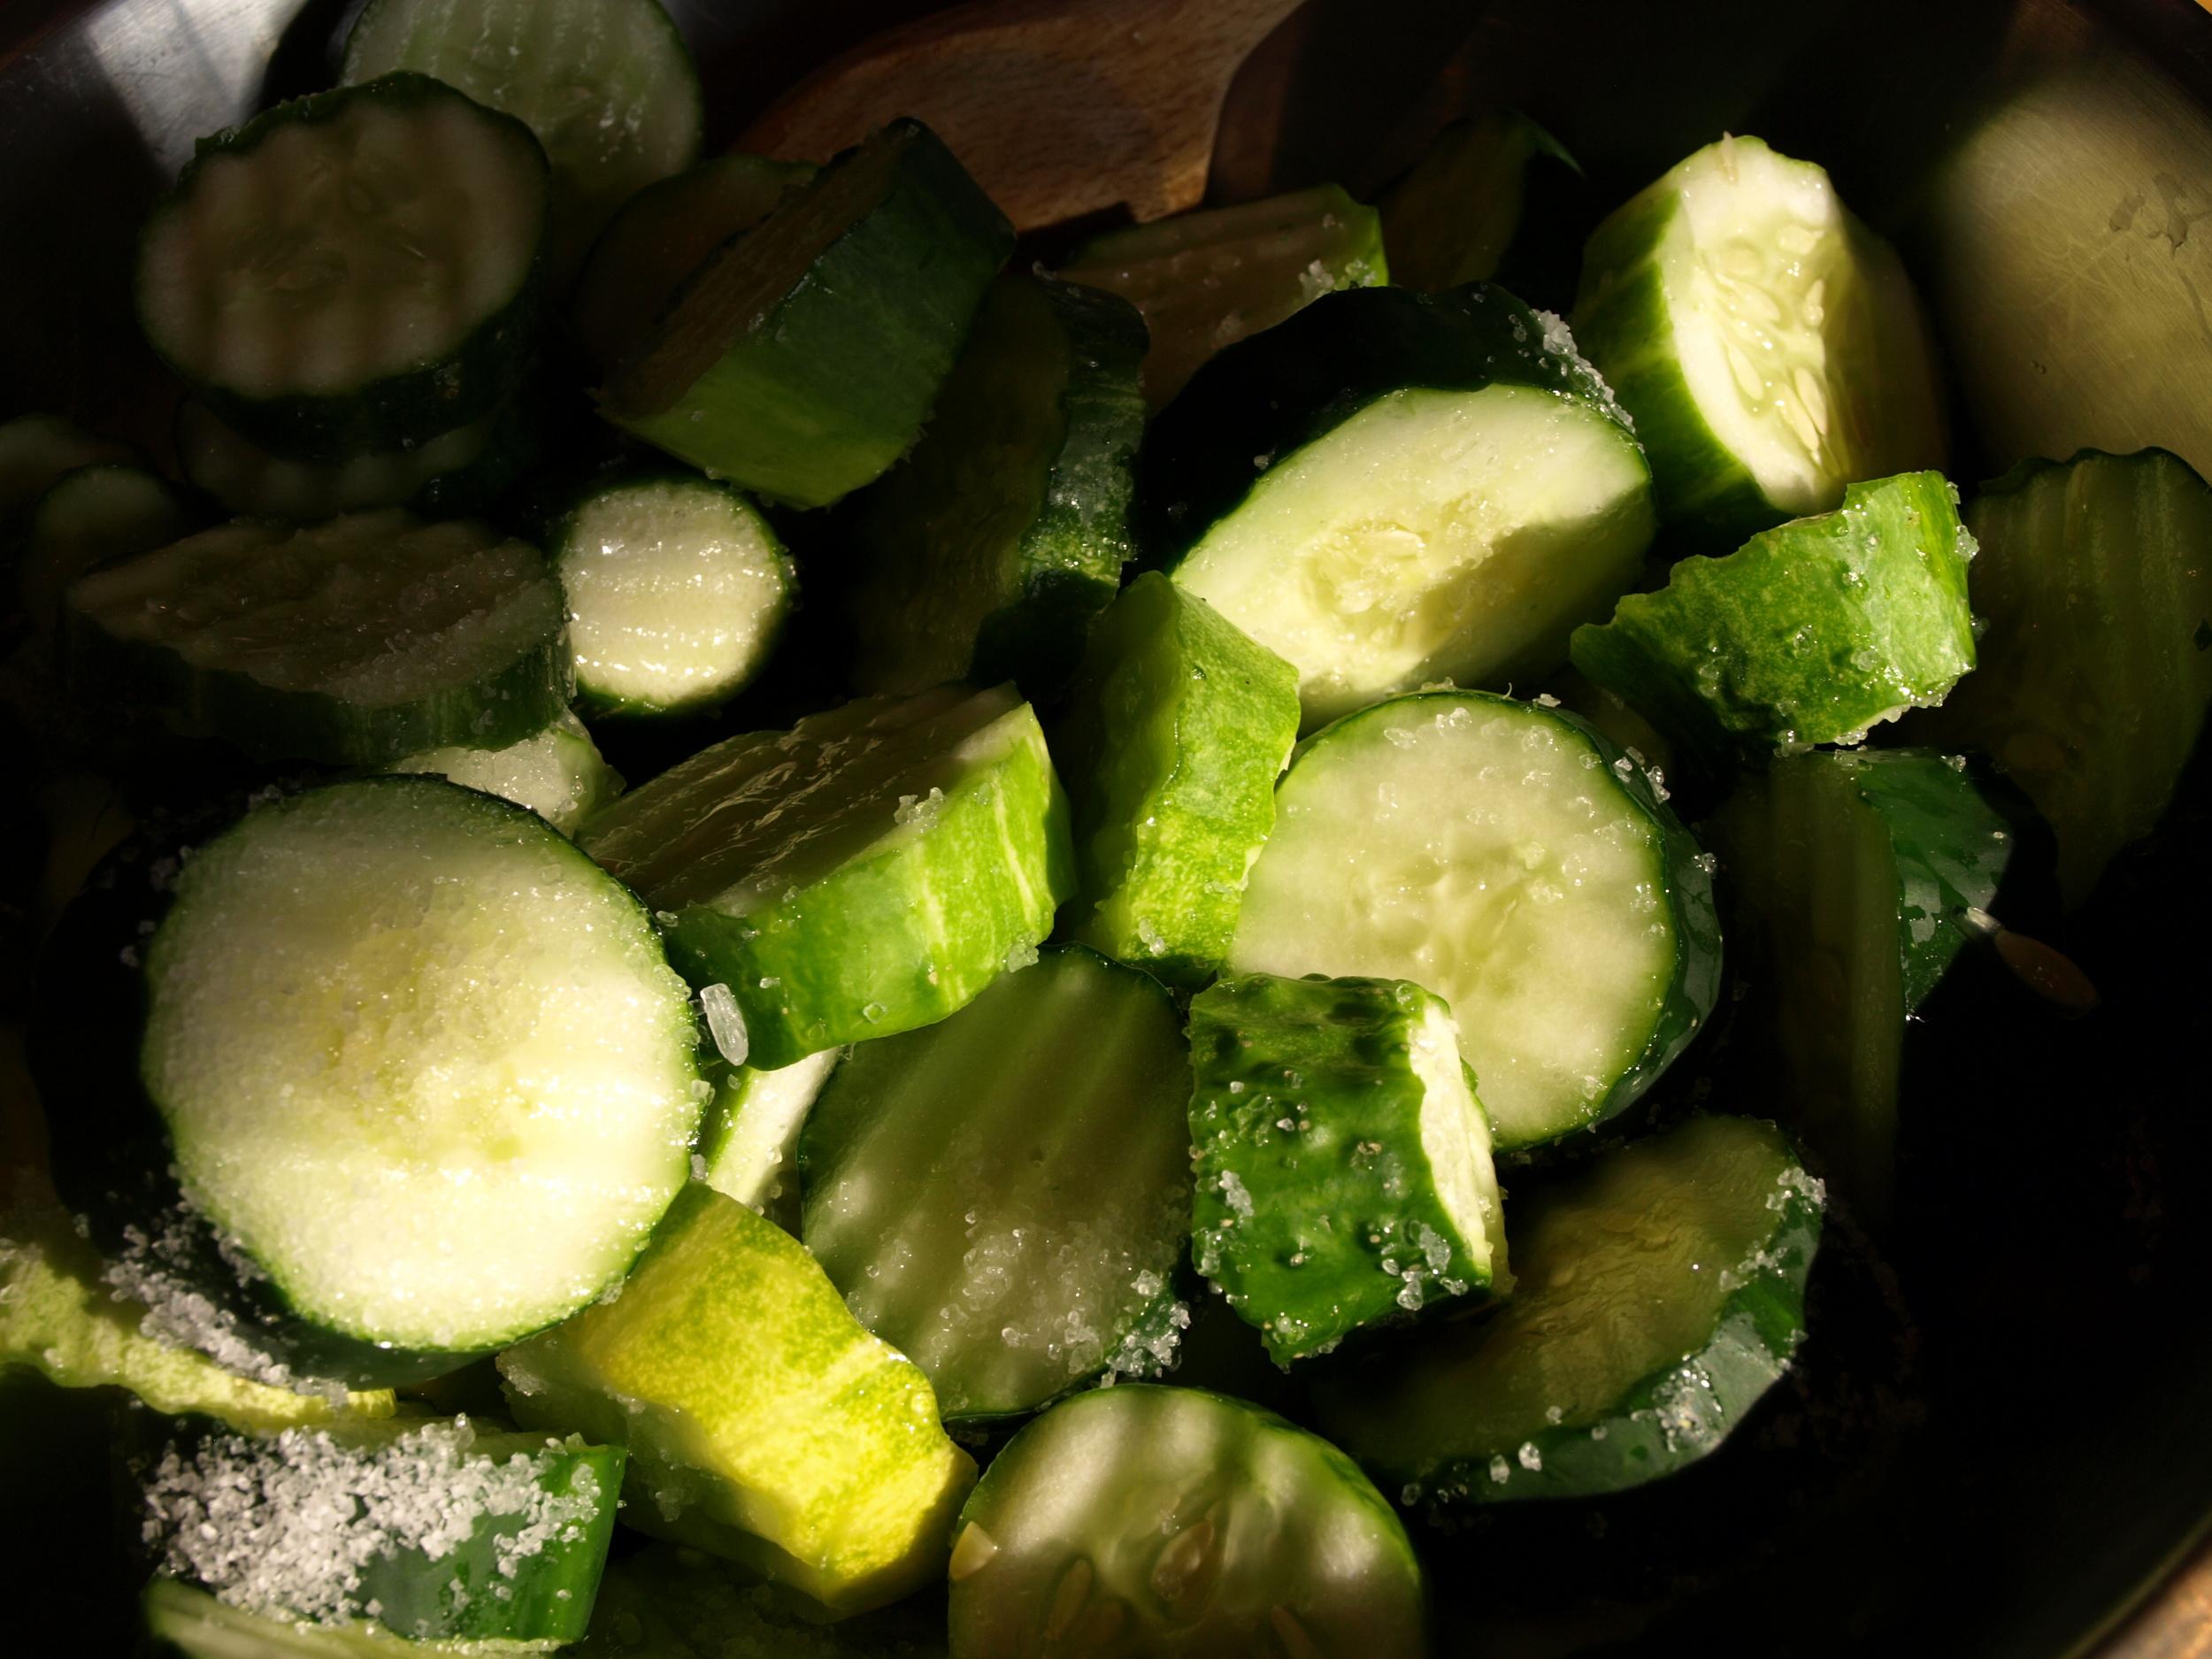 Look at those crinkle cut cucumbers...